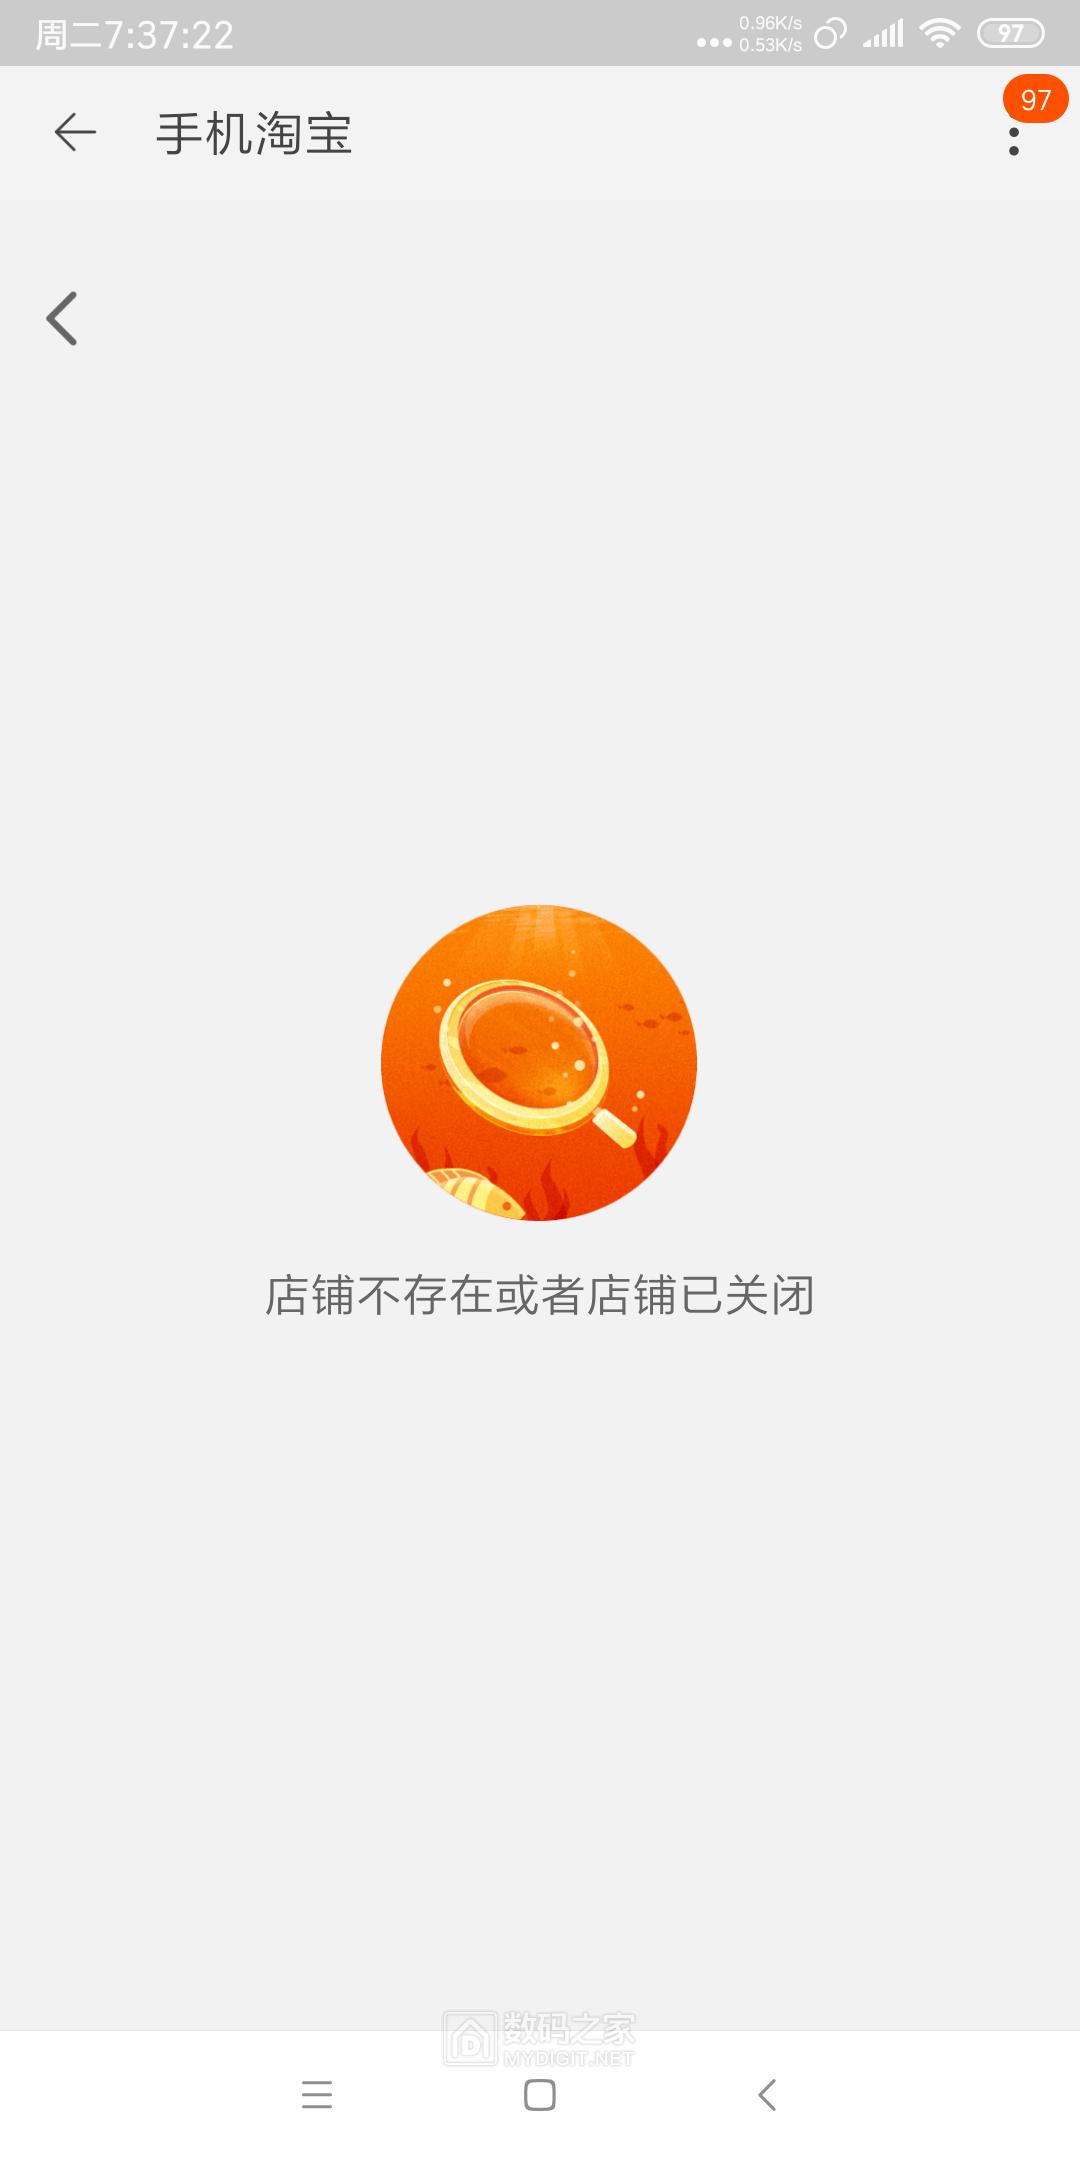 Screenshot_2020-08-25-07-37-22-631_com.taobao.taobao.png